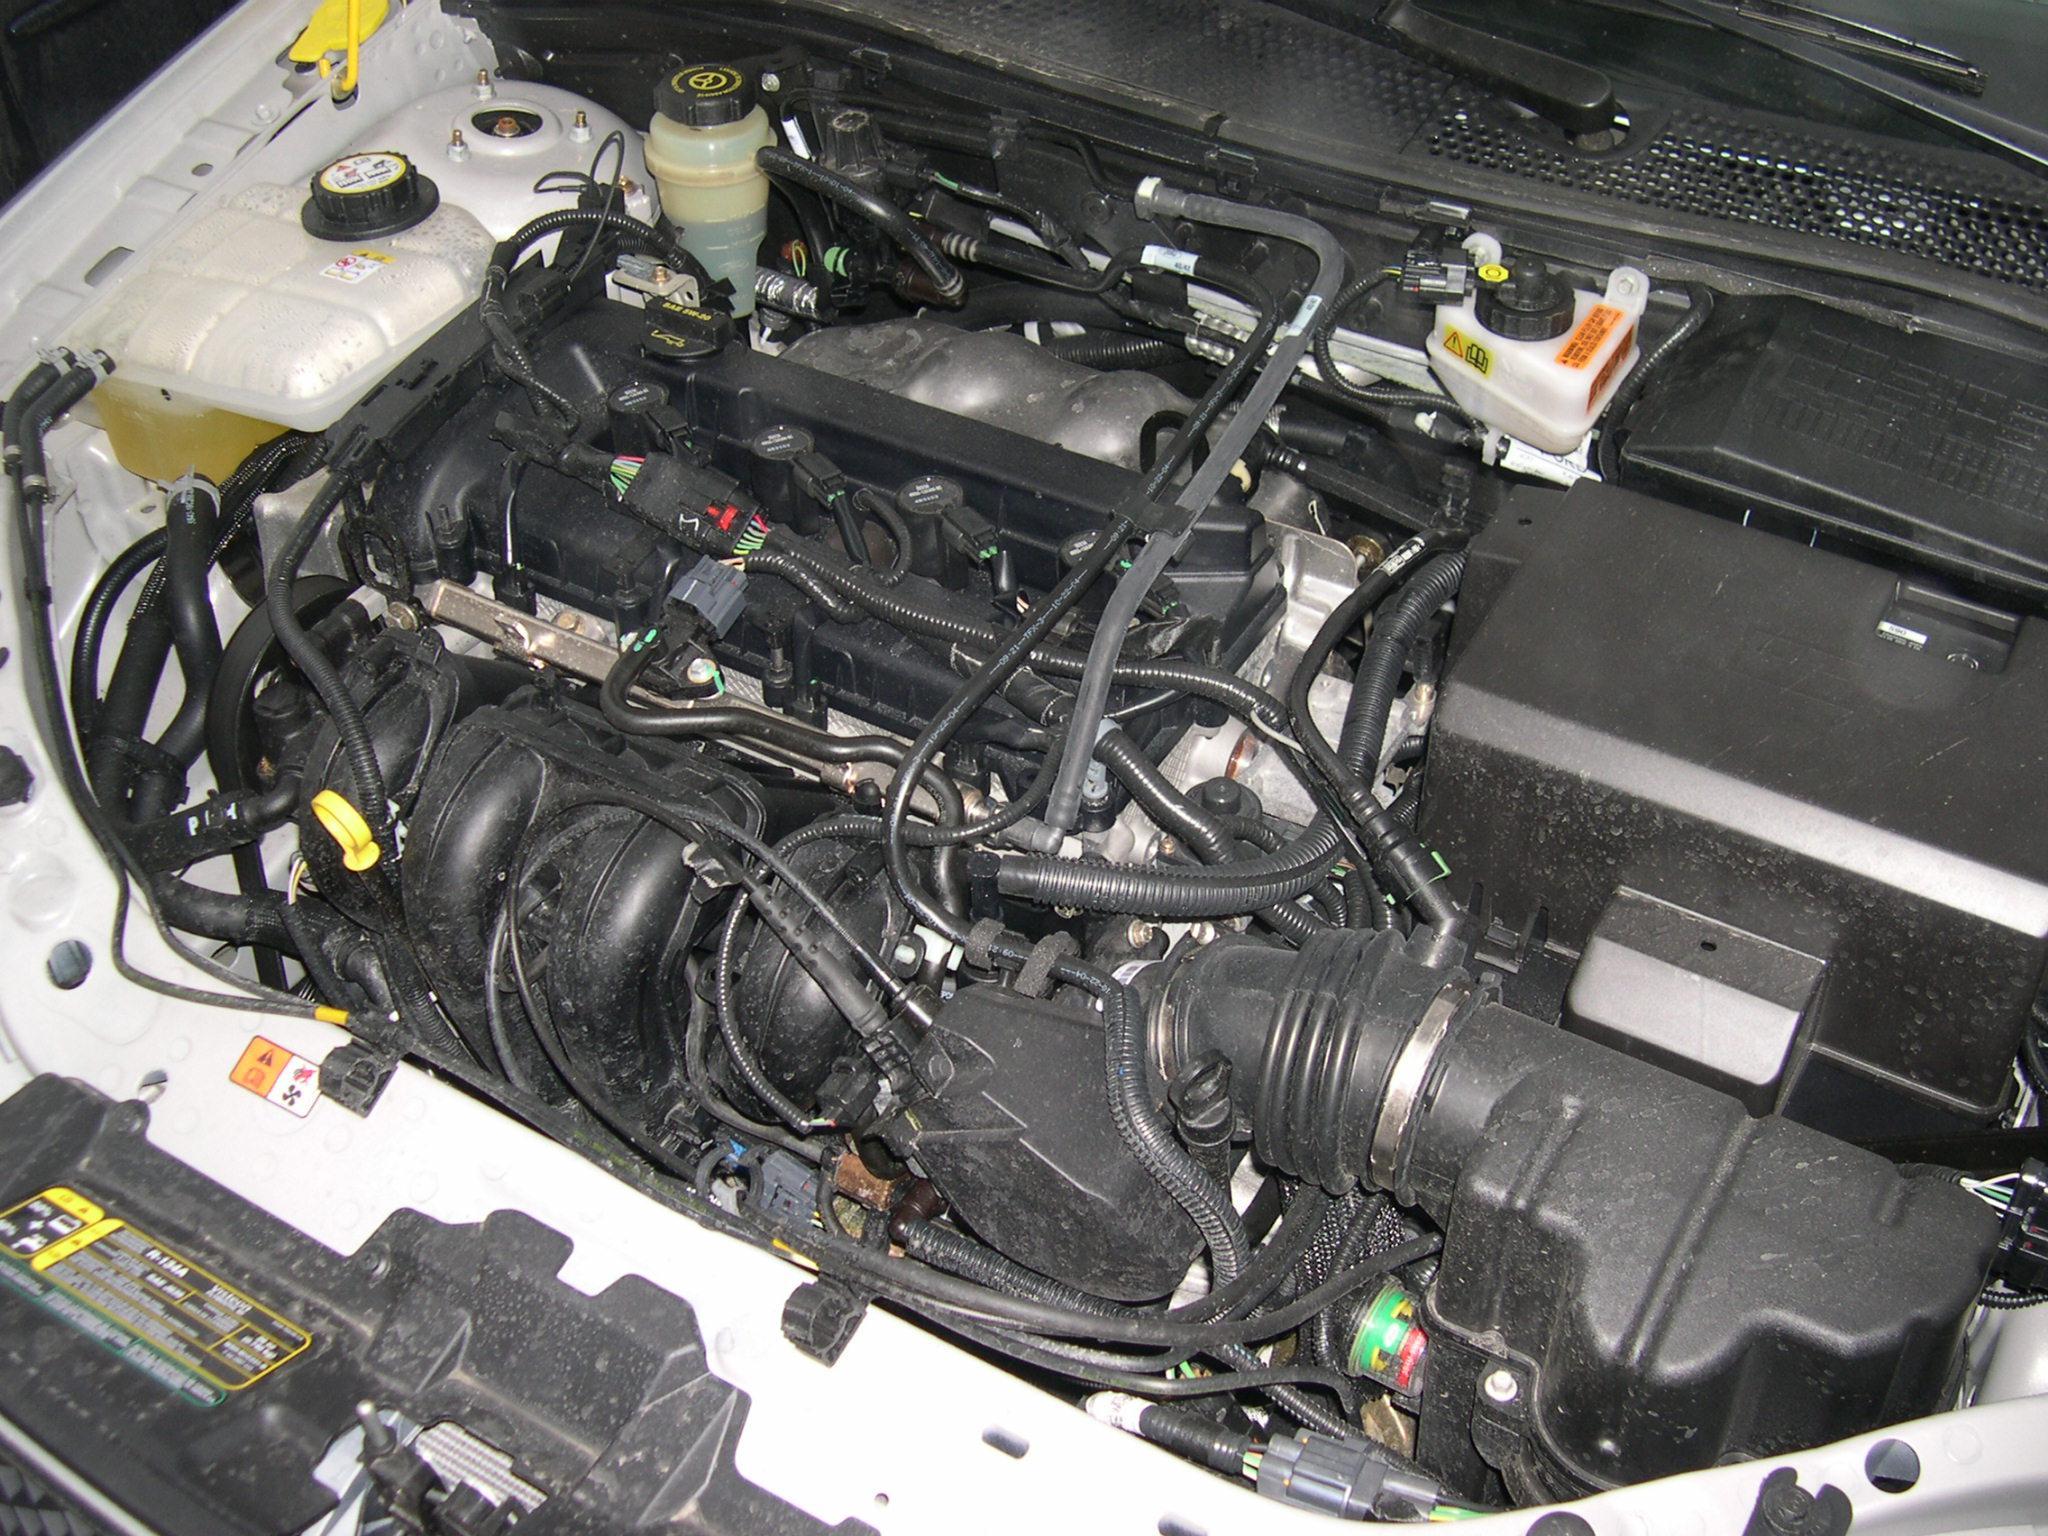 ford focus engine parts diagram john deere mazda 2 3 turbo free image